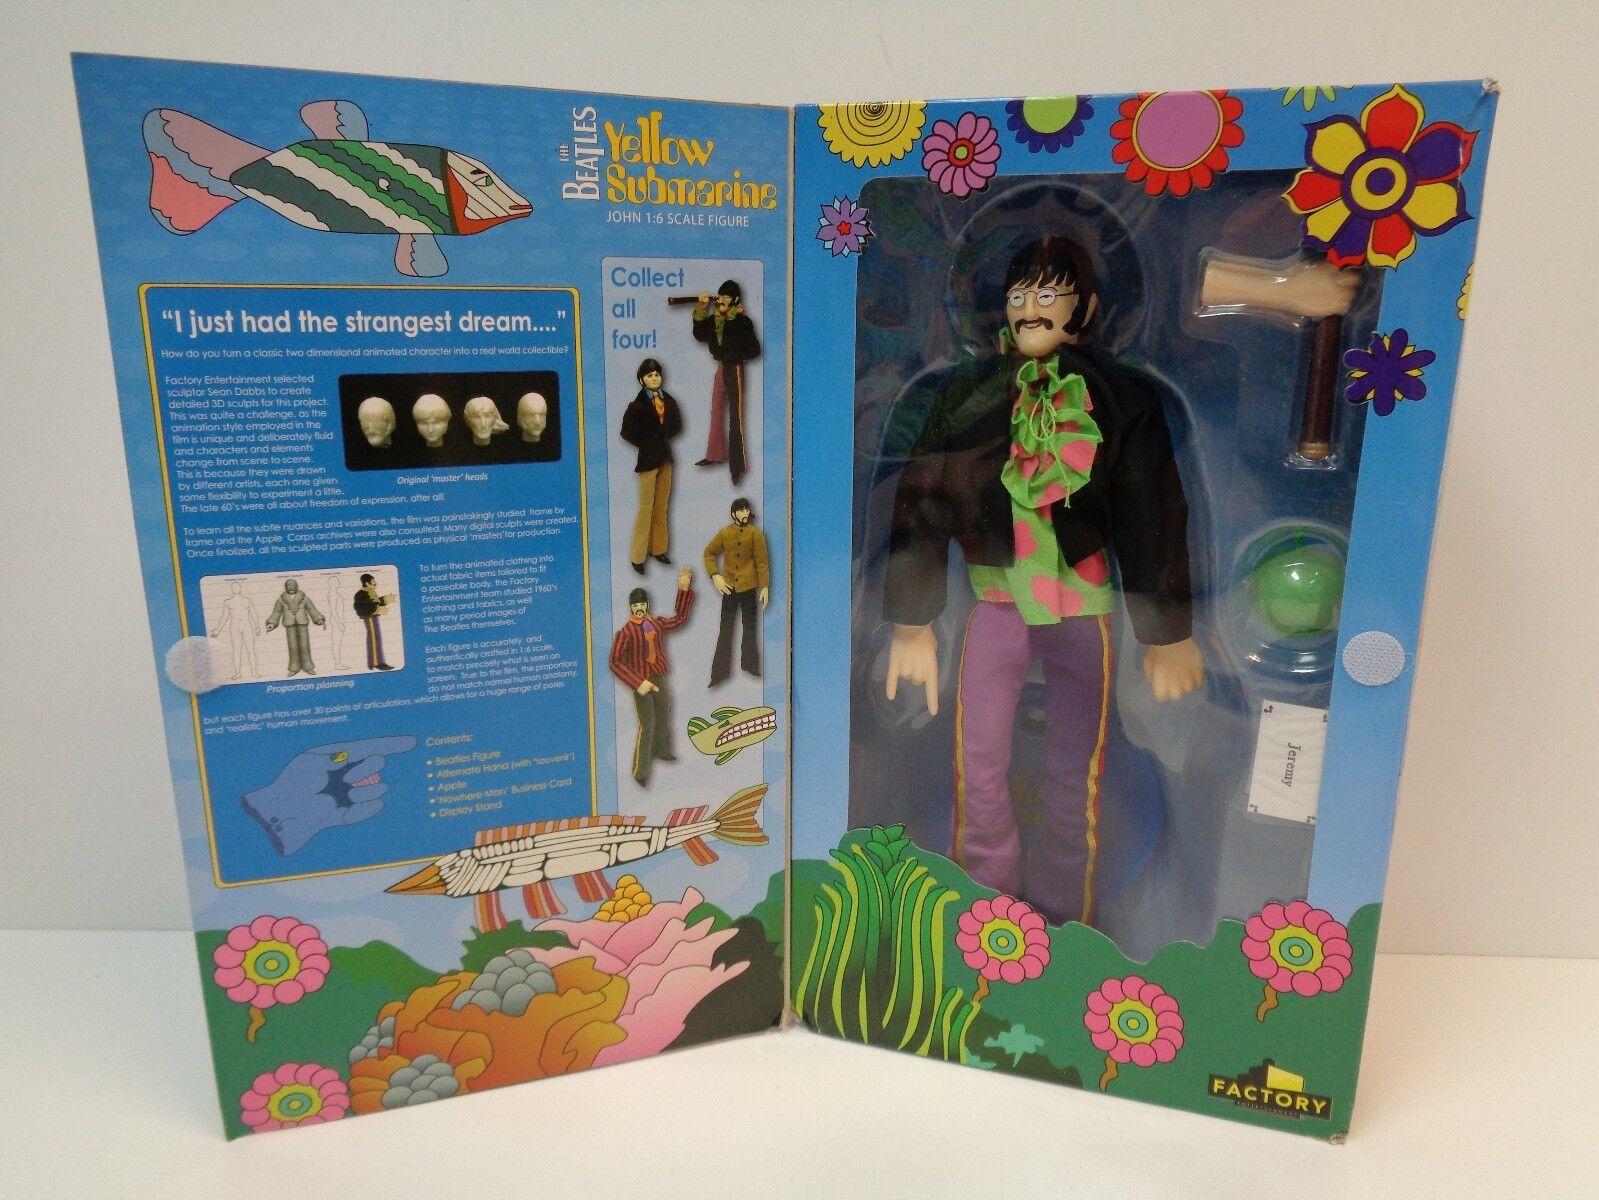 The Beatles-jaune Submarine John 1 6th scale figure-FACTORY ENTERTAINMENT